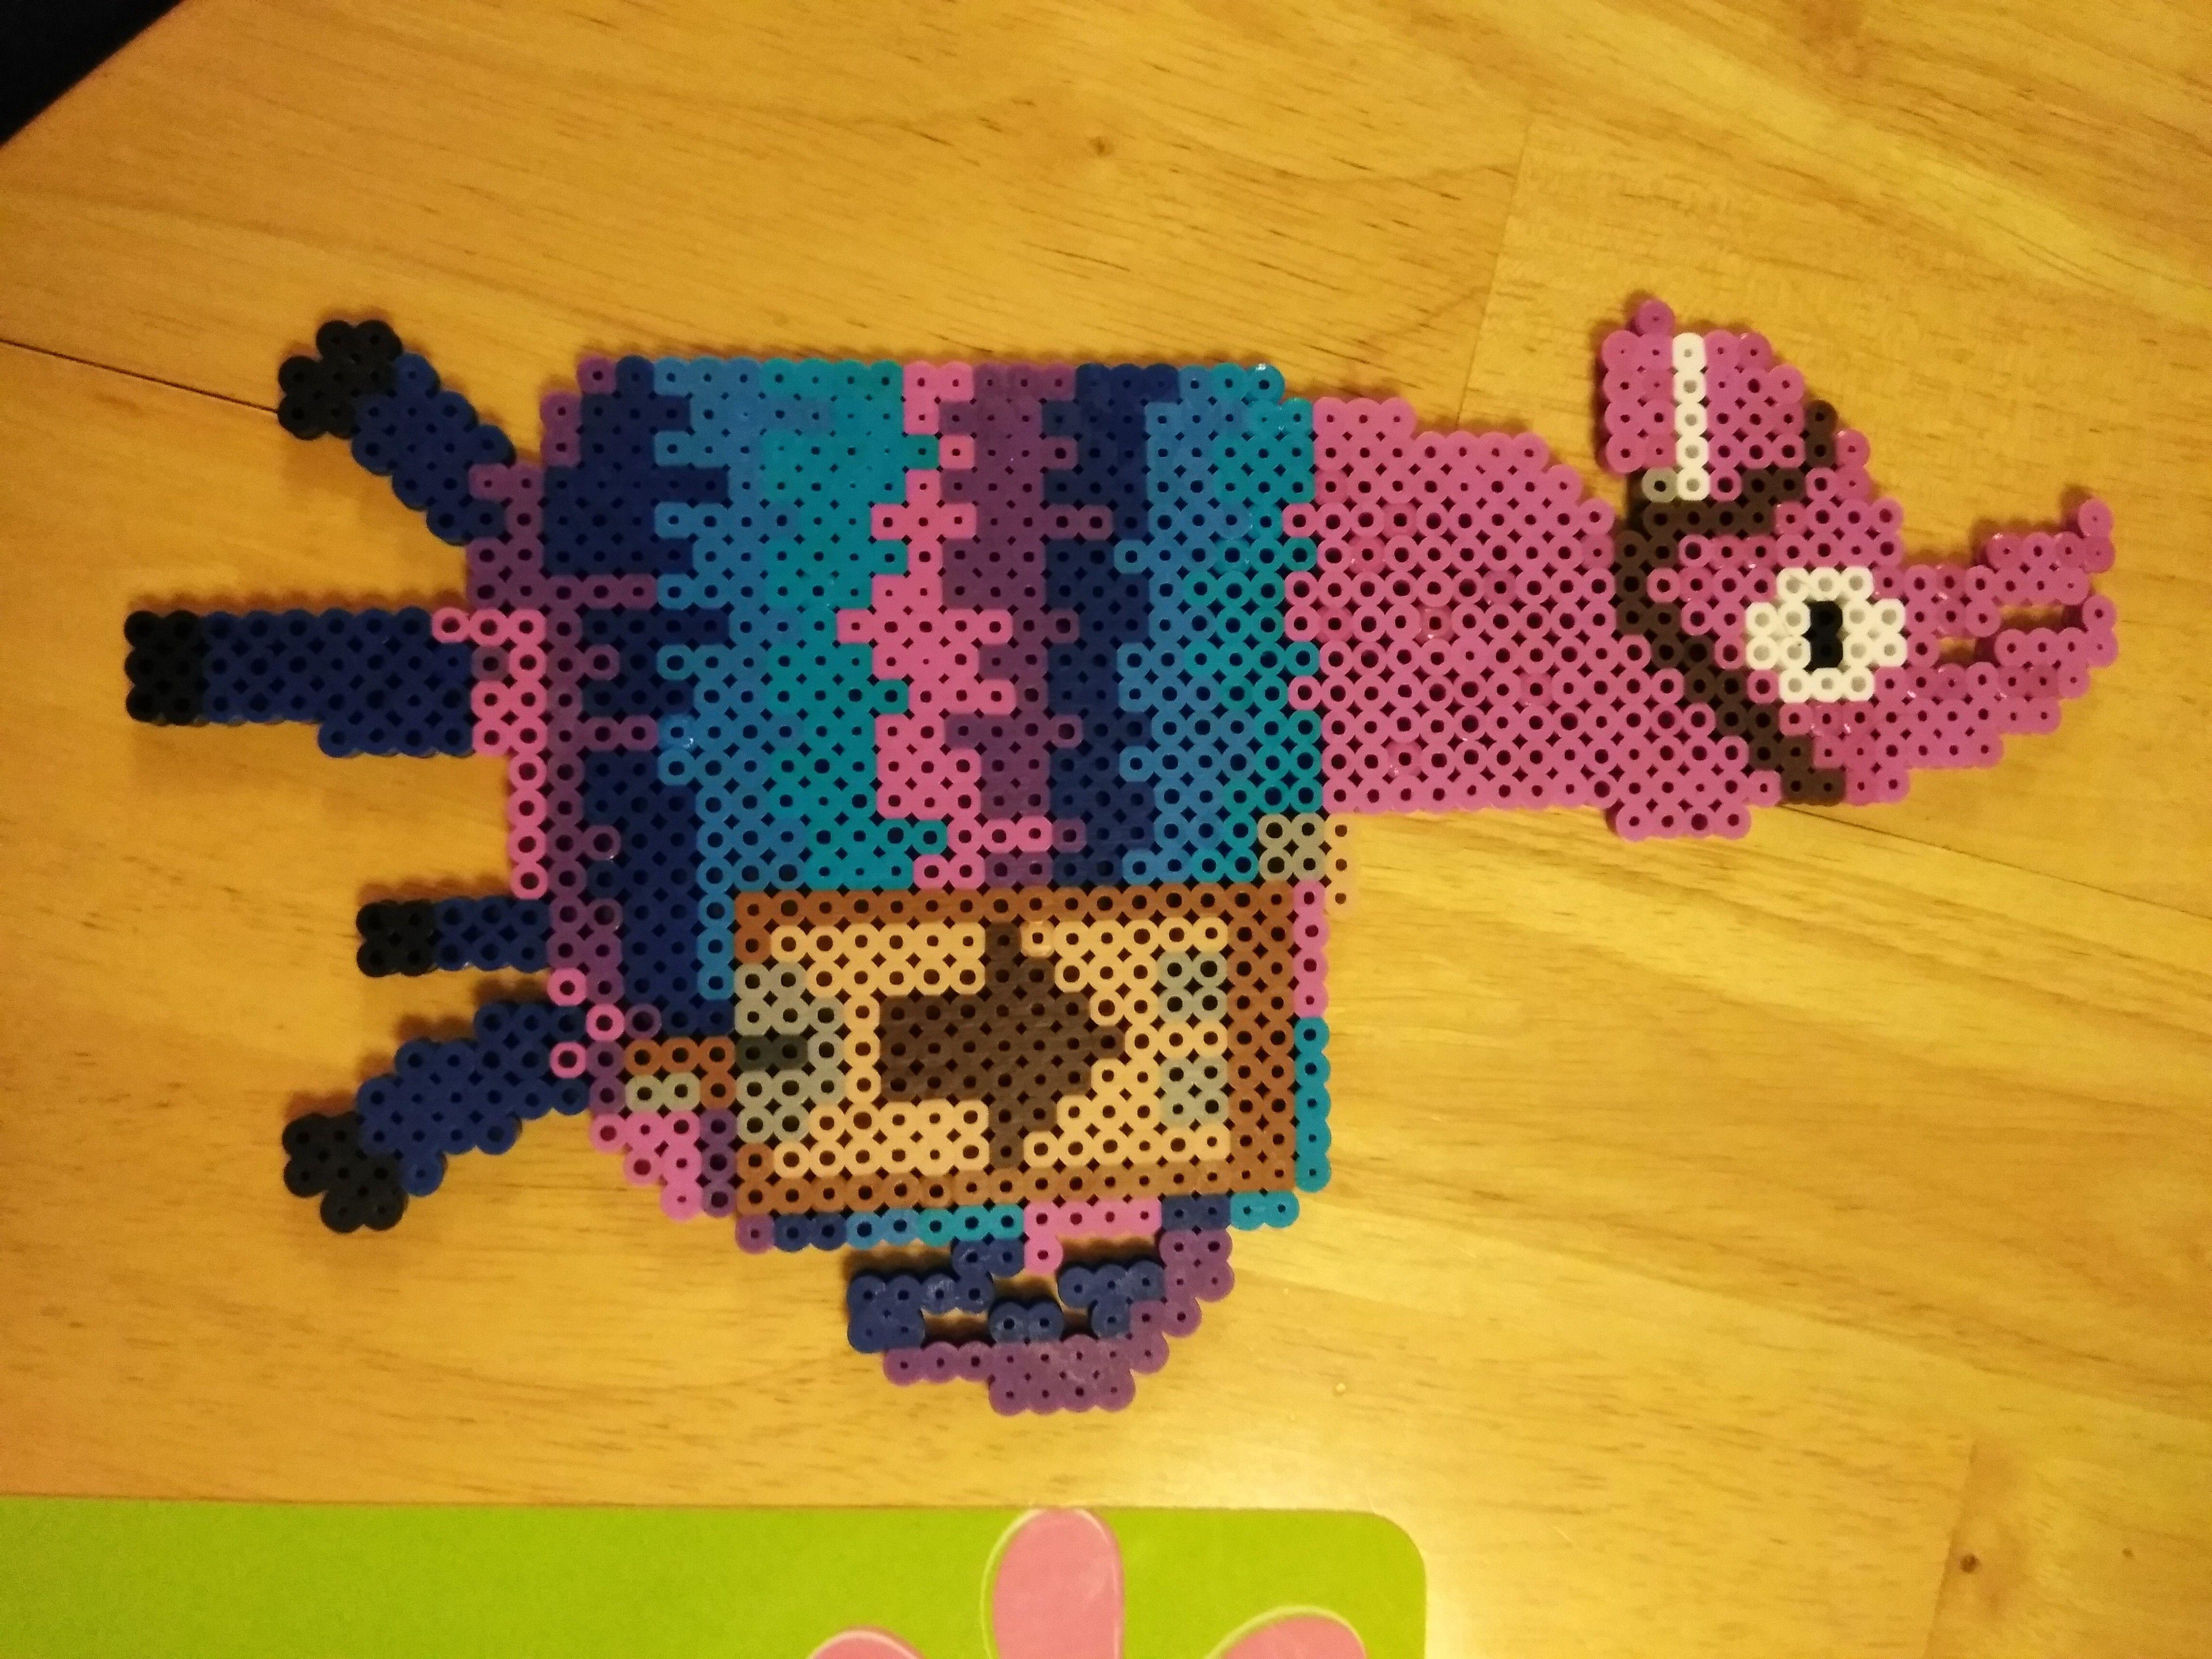 26a2c06806e57 Fortnite Llama made with perler beads | perler breads | Perler beads ...